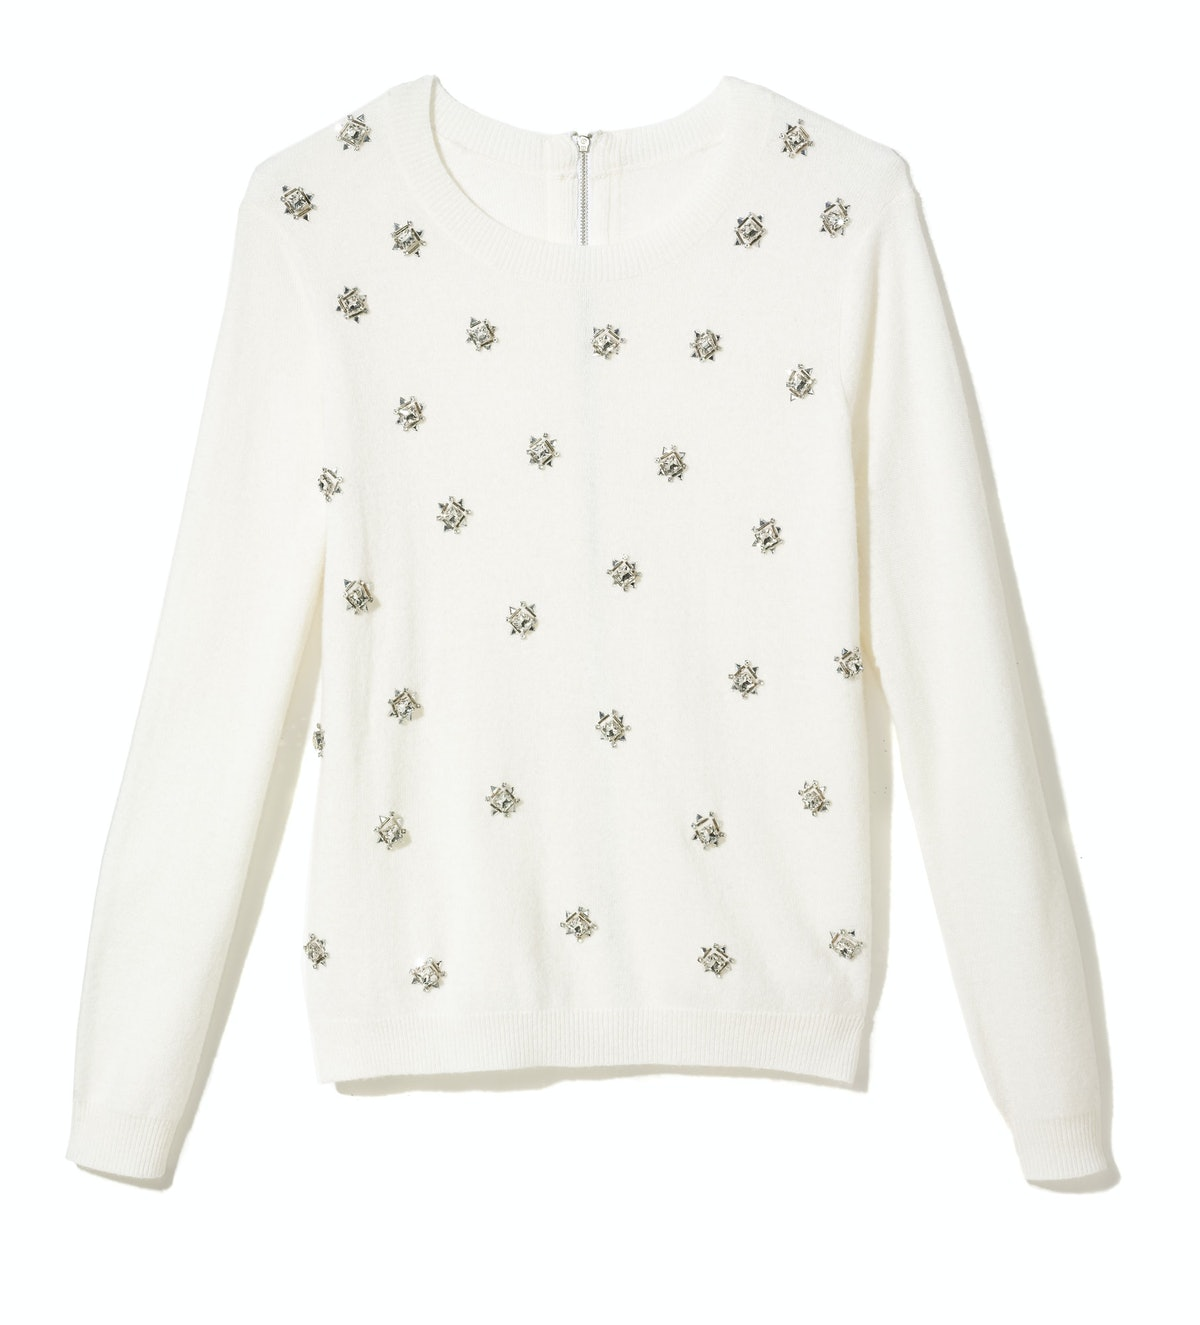 Rebecca Taylor sweater, $450, [rebeccataylor.com](http://rstyle.me/n/crsmj35fn).